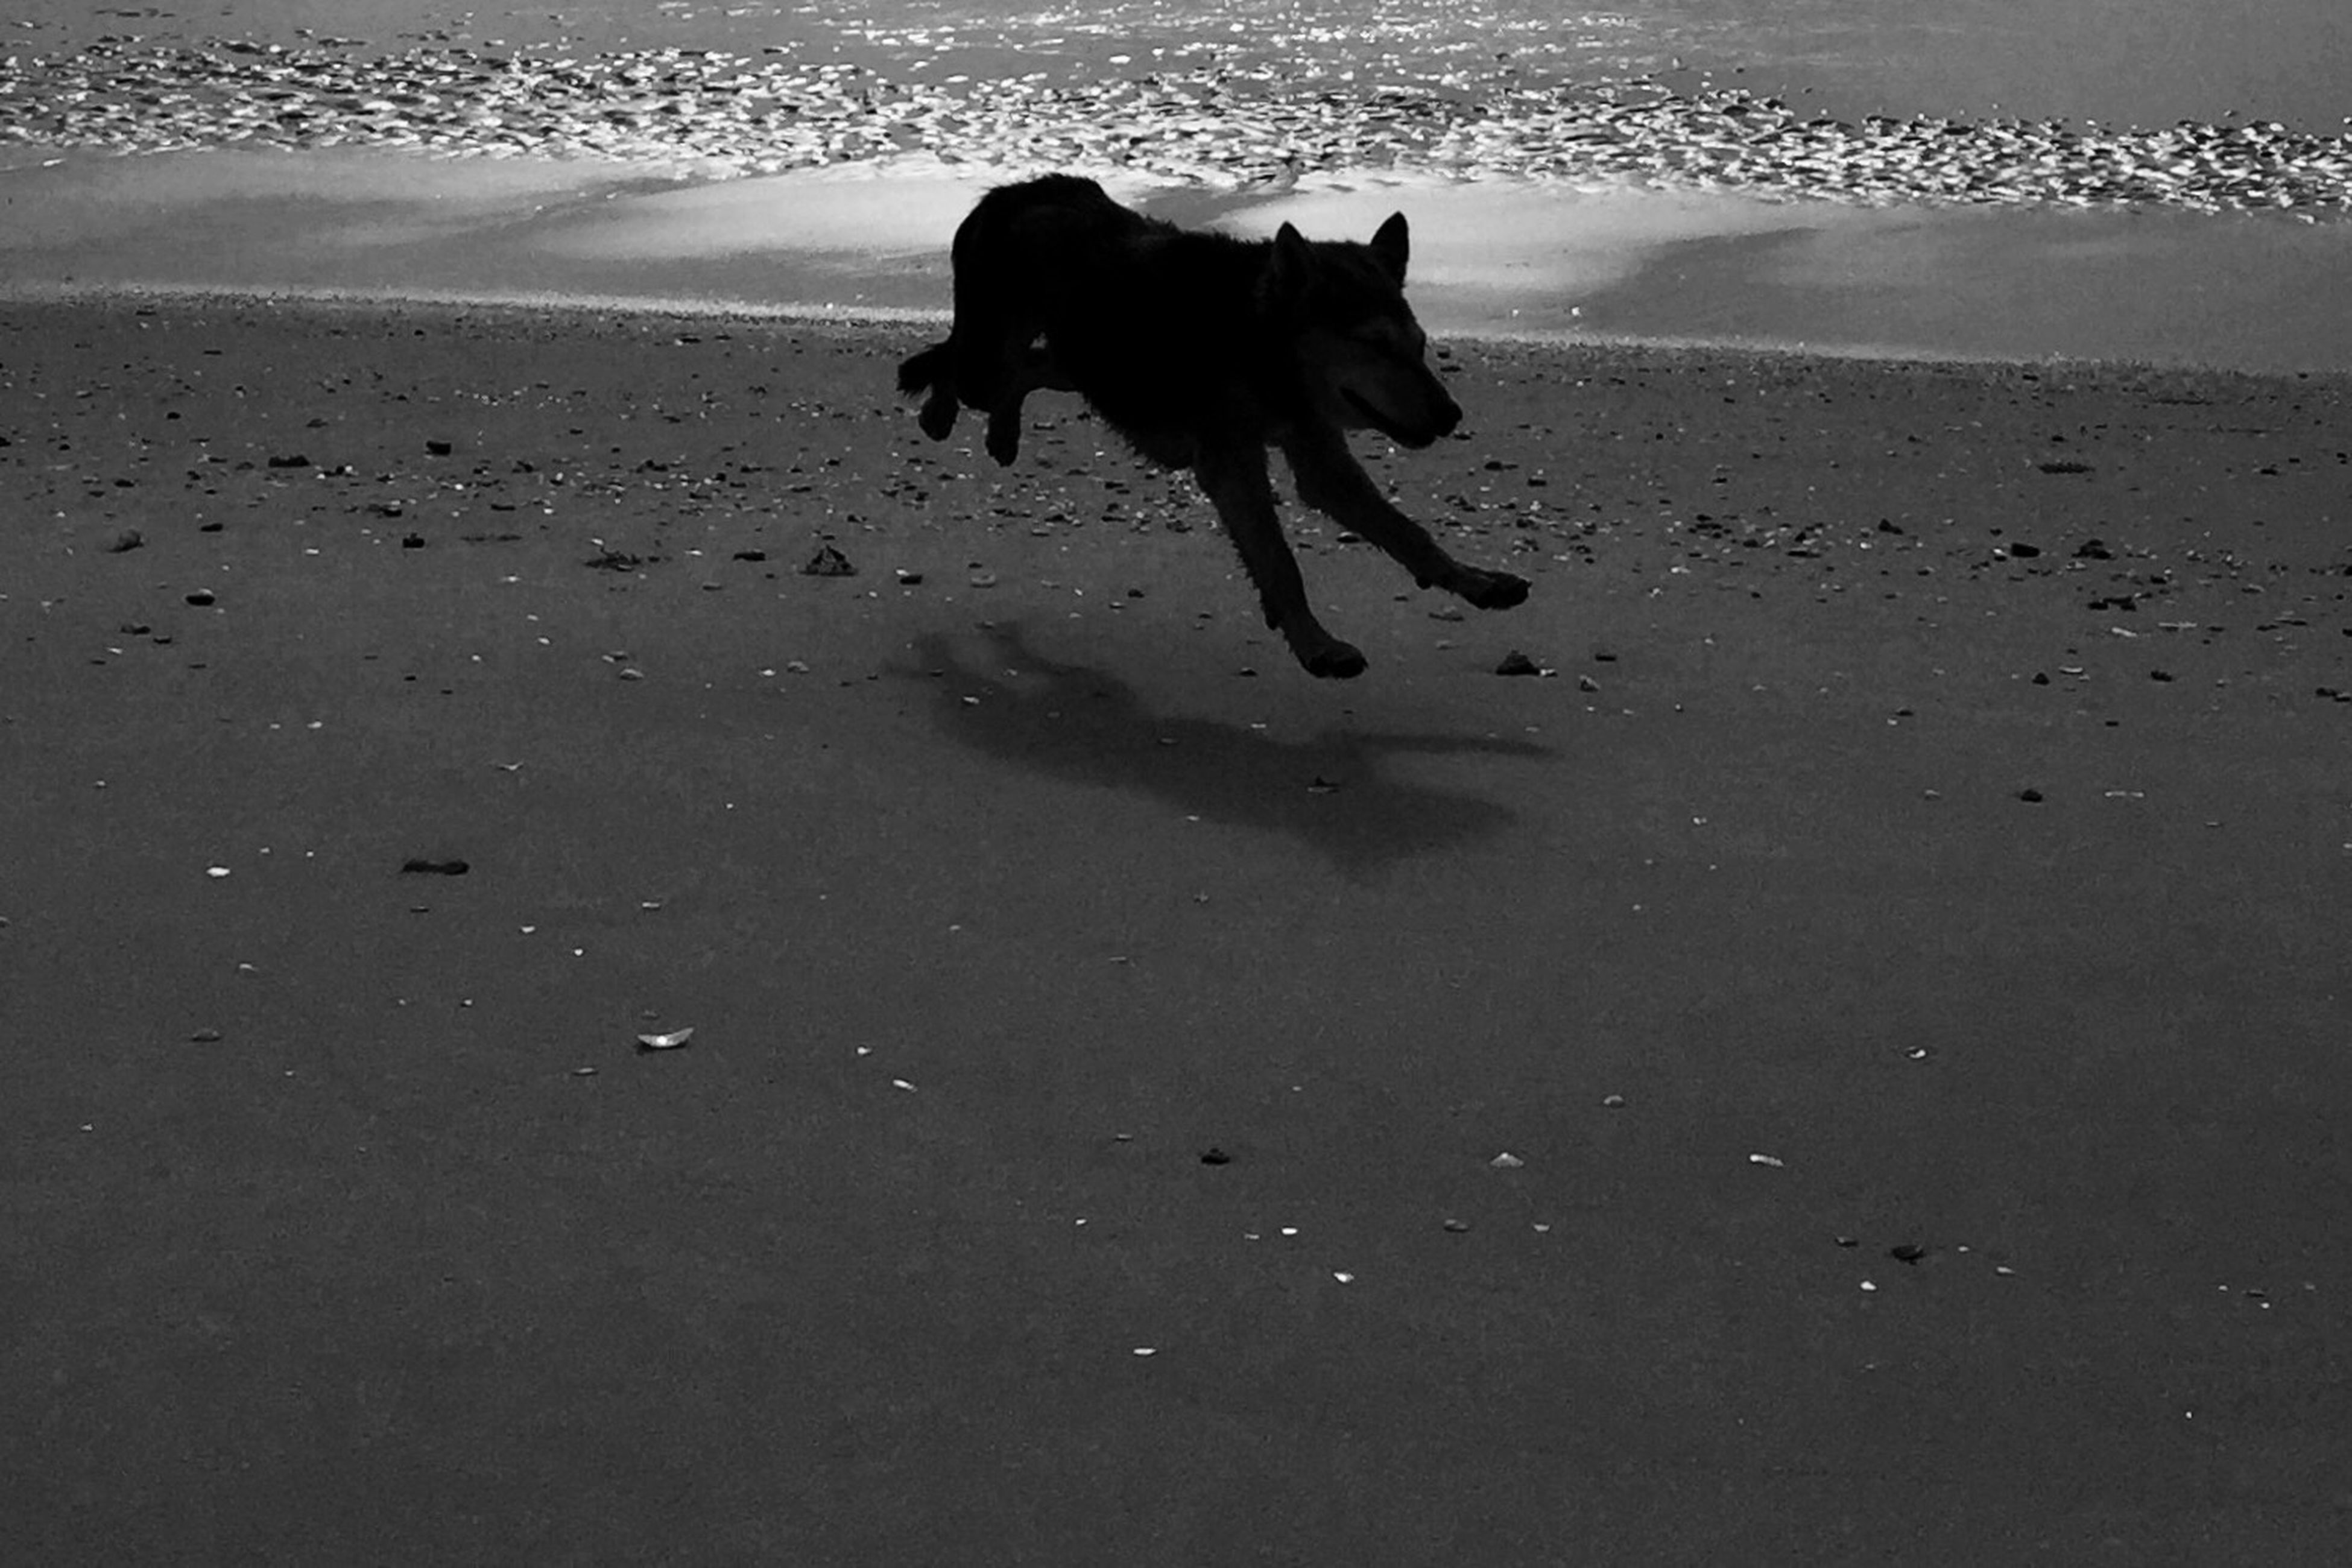 animal themes, dog, pets, domestic animals, one animal, beach, mammal, sea, sand, water, shore, horizon over water, nature, high angle view, full length, sunlight, shadow, walking, day, running